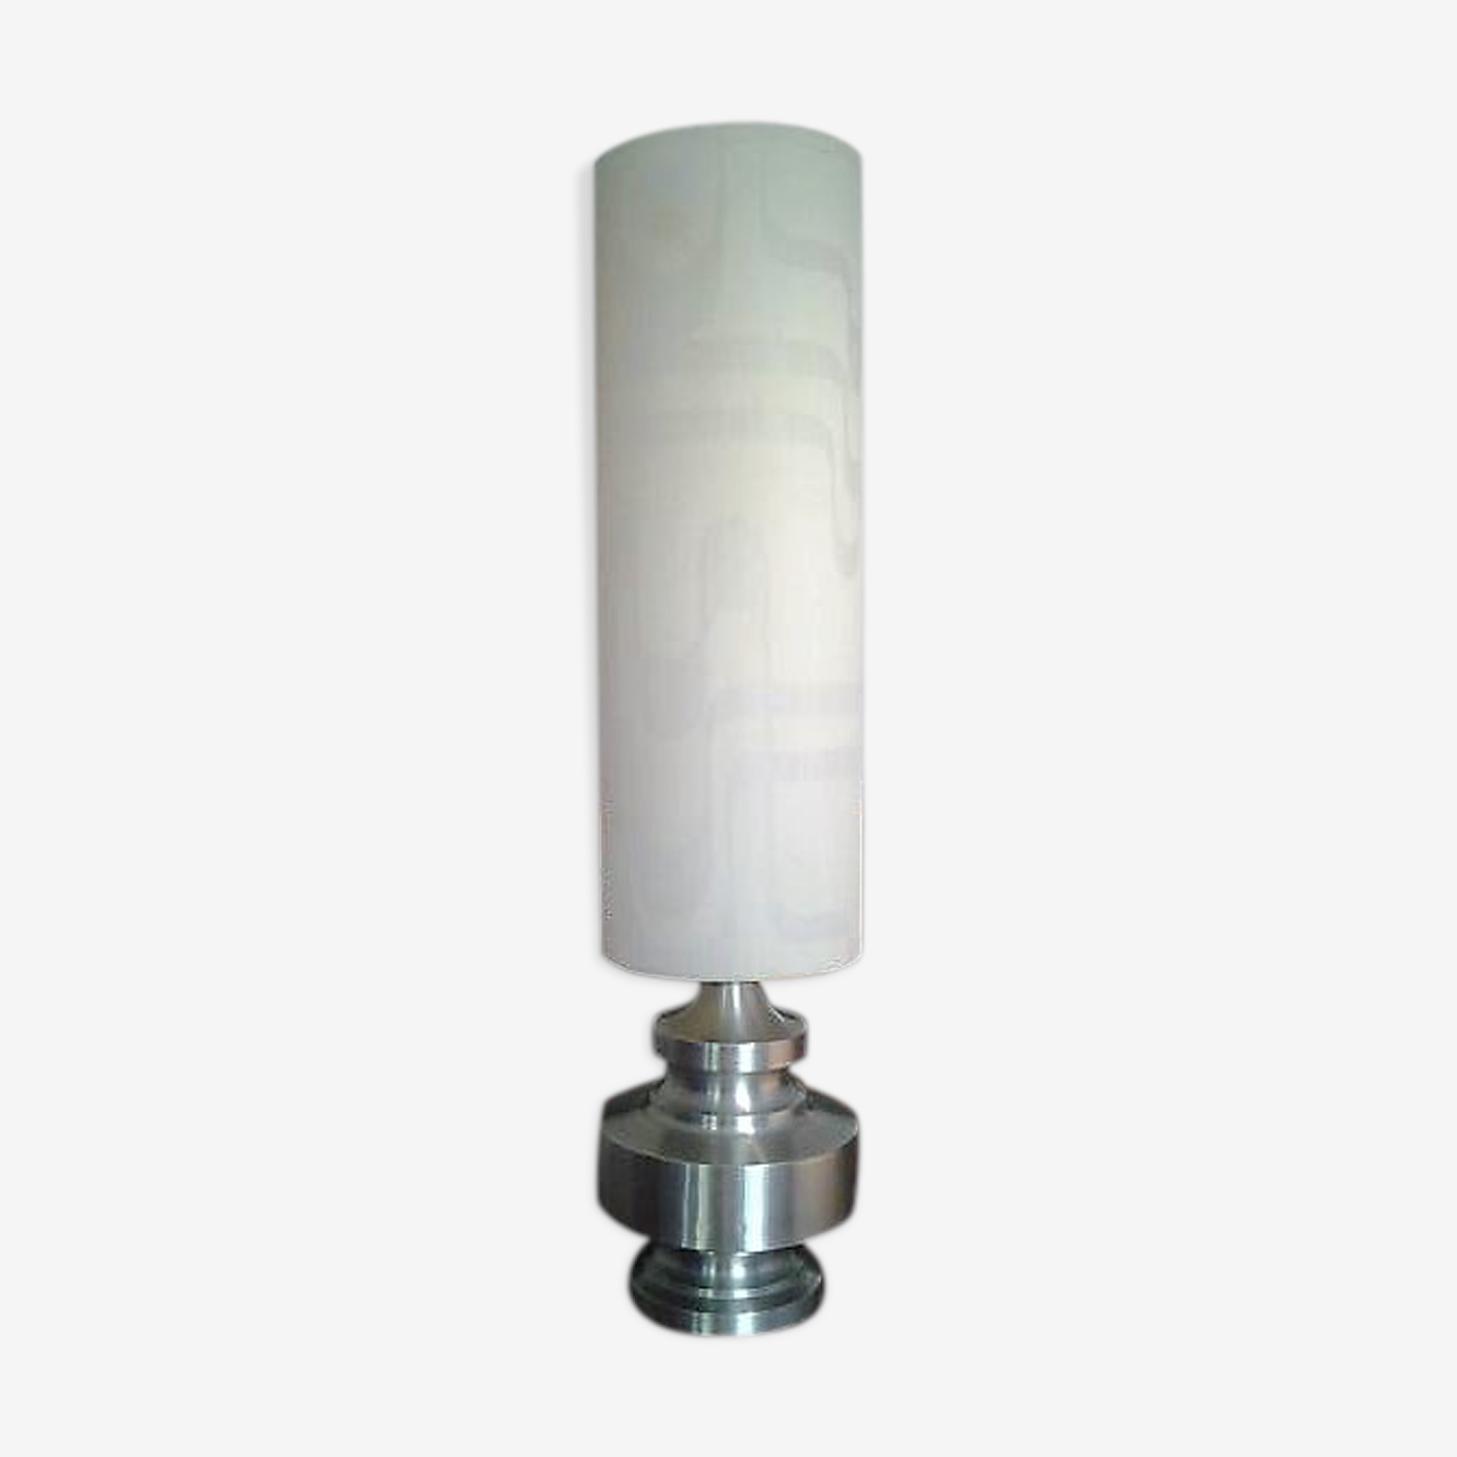 Lampe de salon design en métal brossé 1970